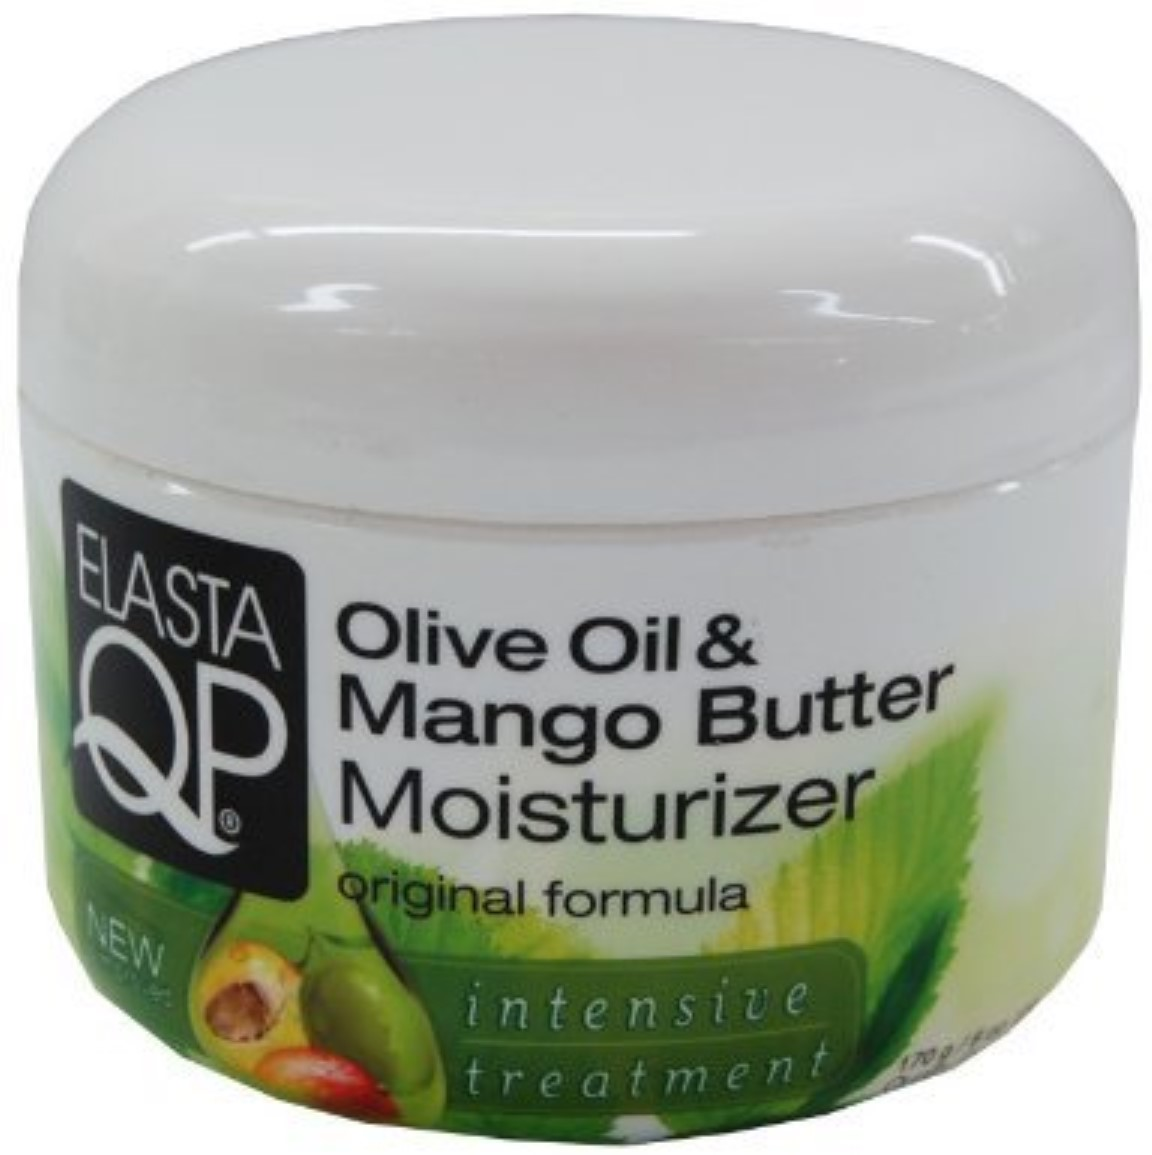 Elasta QP Olive Oil and Mango Butter Moisturizer, 8.25 oz (Pack of 2)